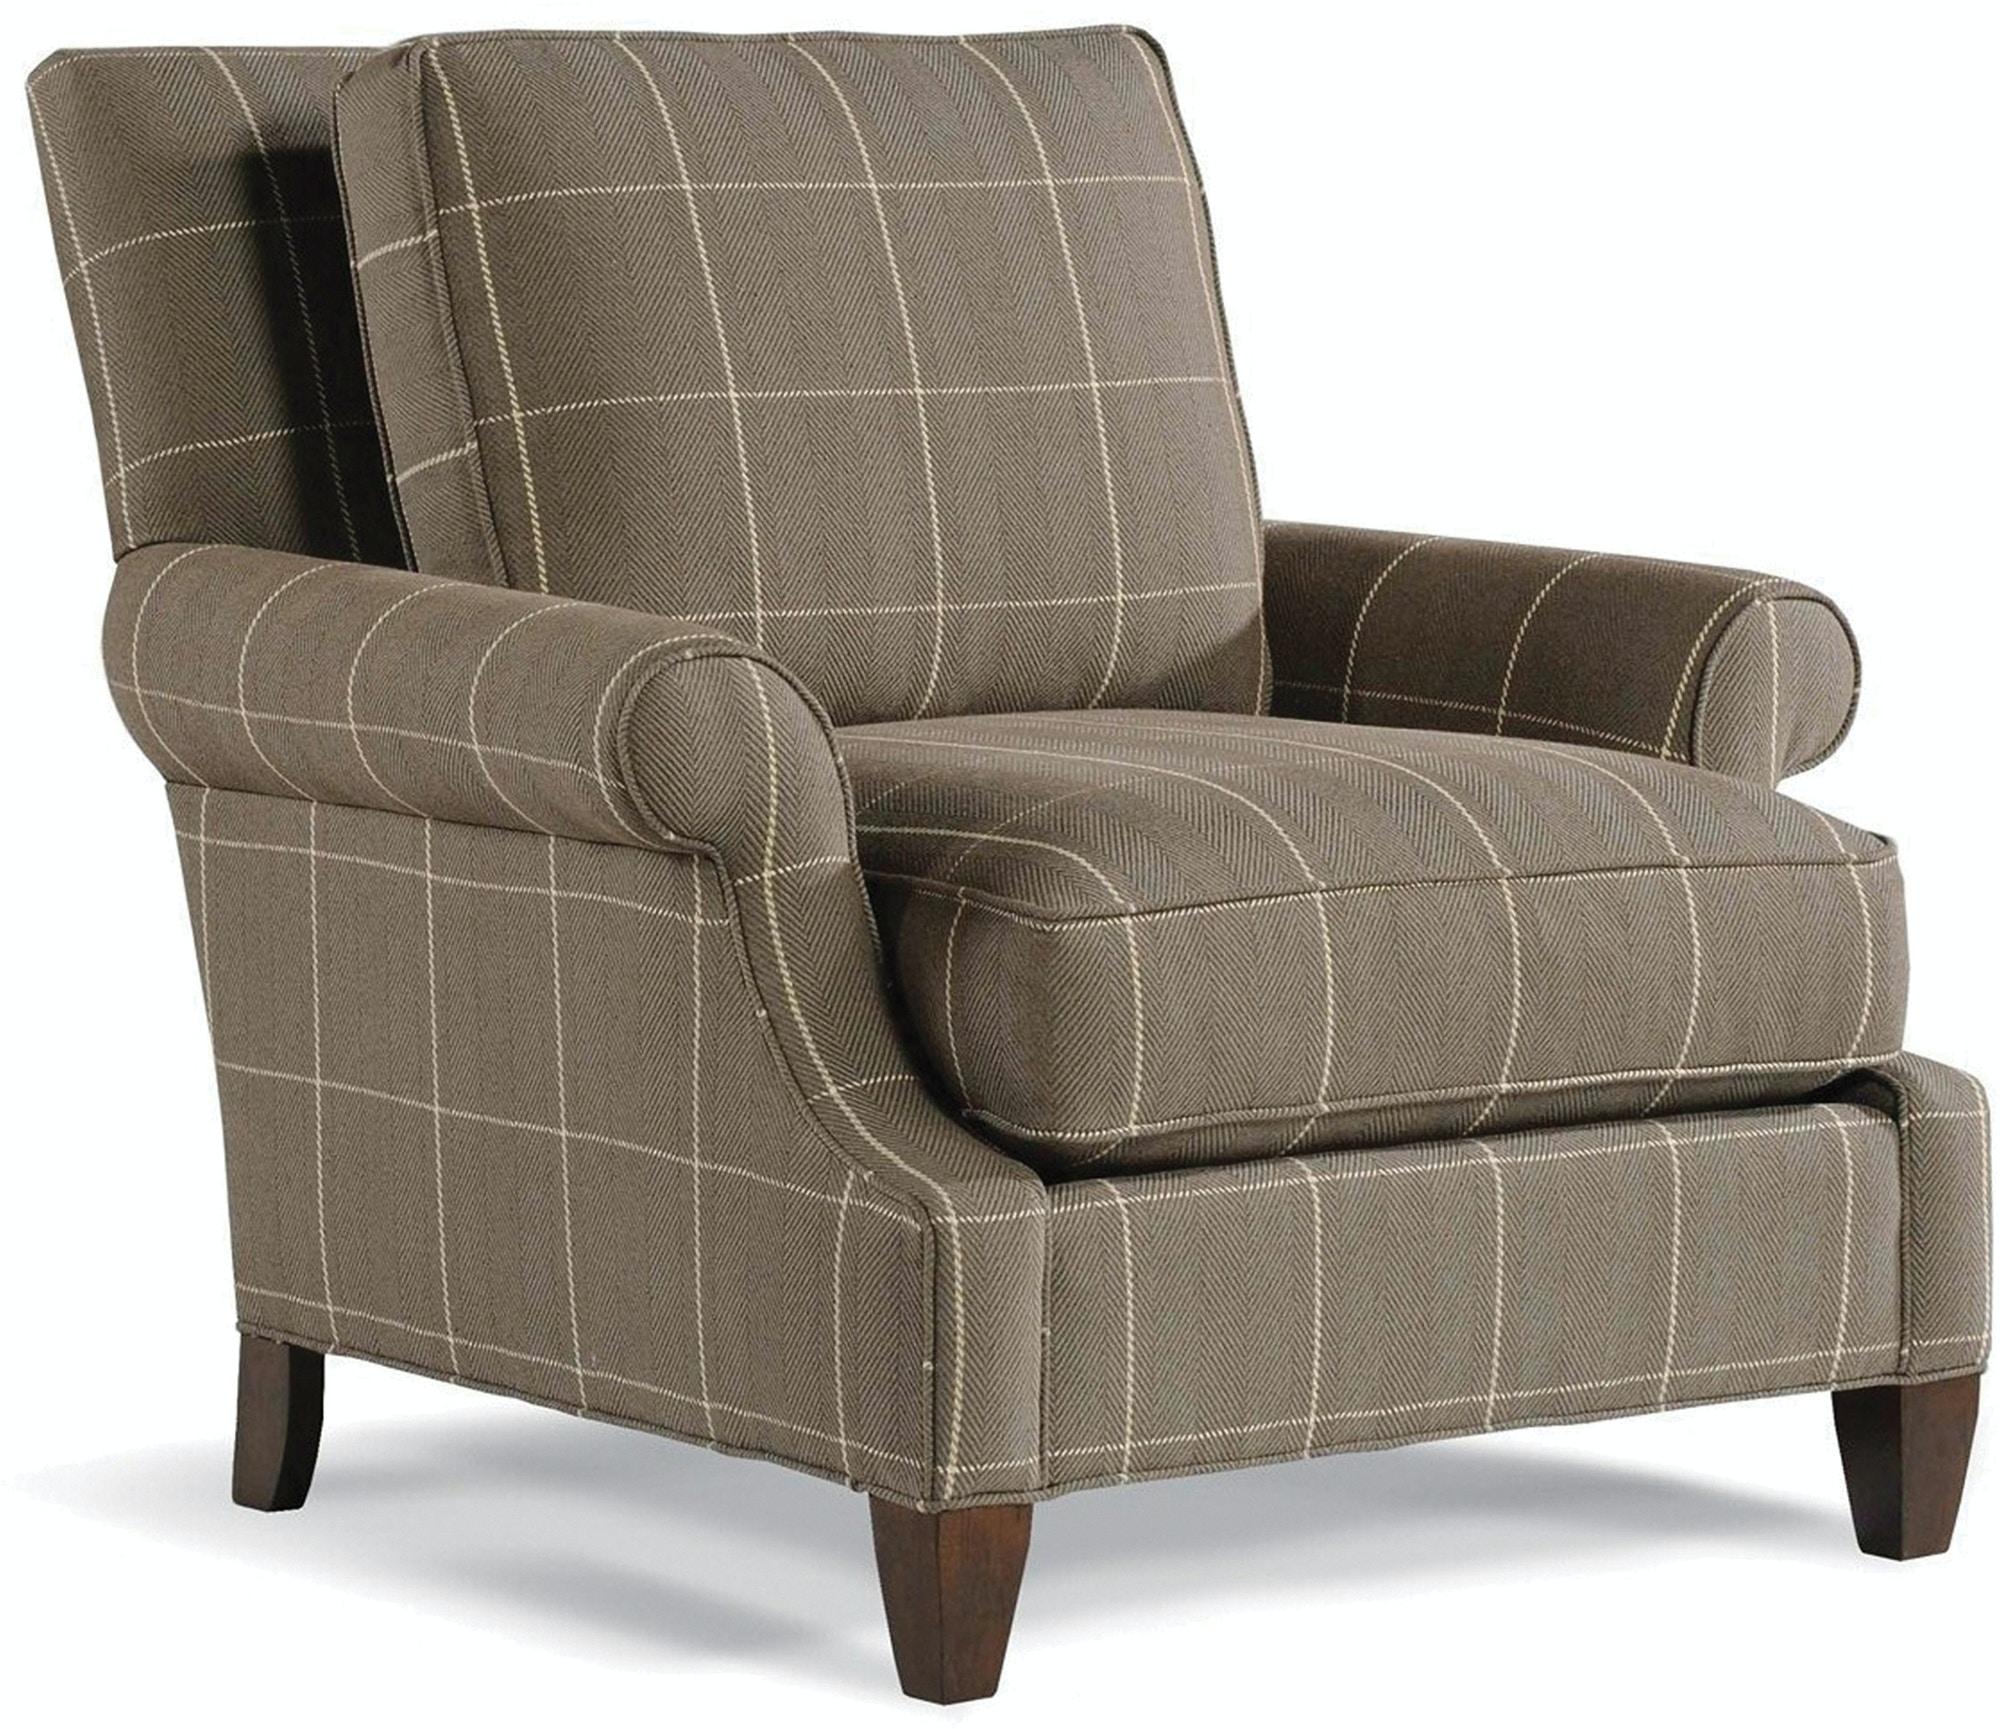 Taylor King Furniture K4701 Living Room Renee Chair